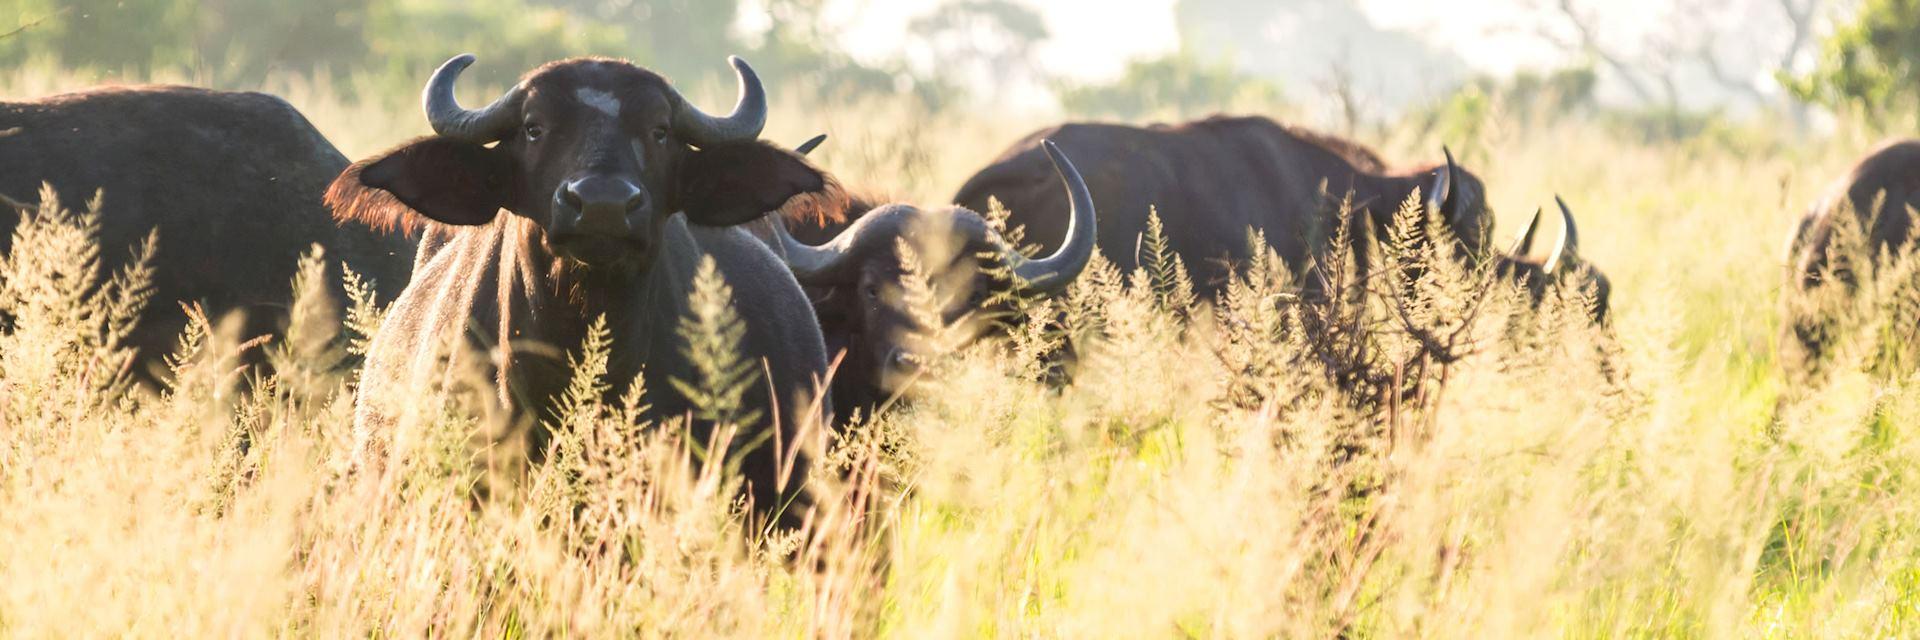 Cape buffalo, Saadani National Park